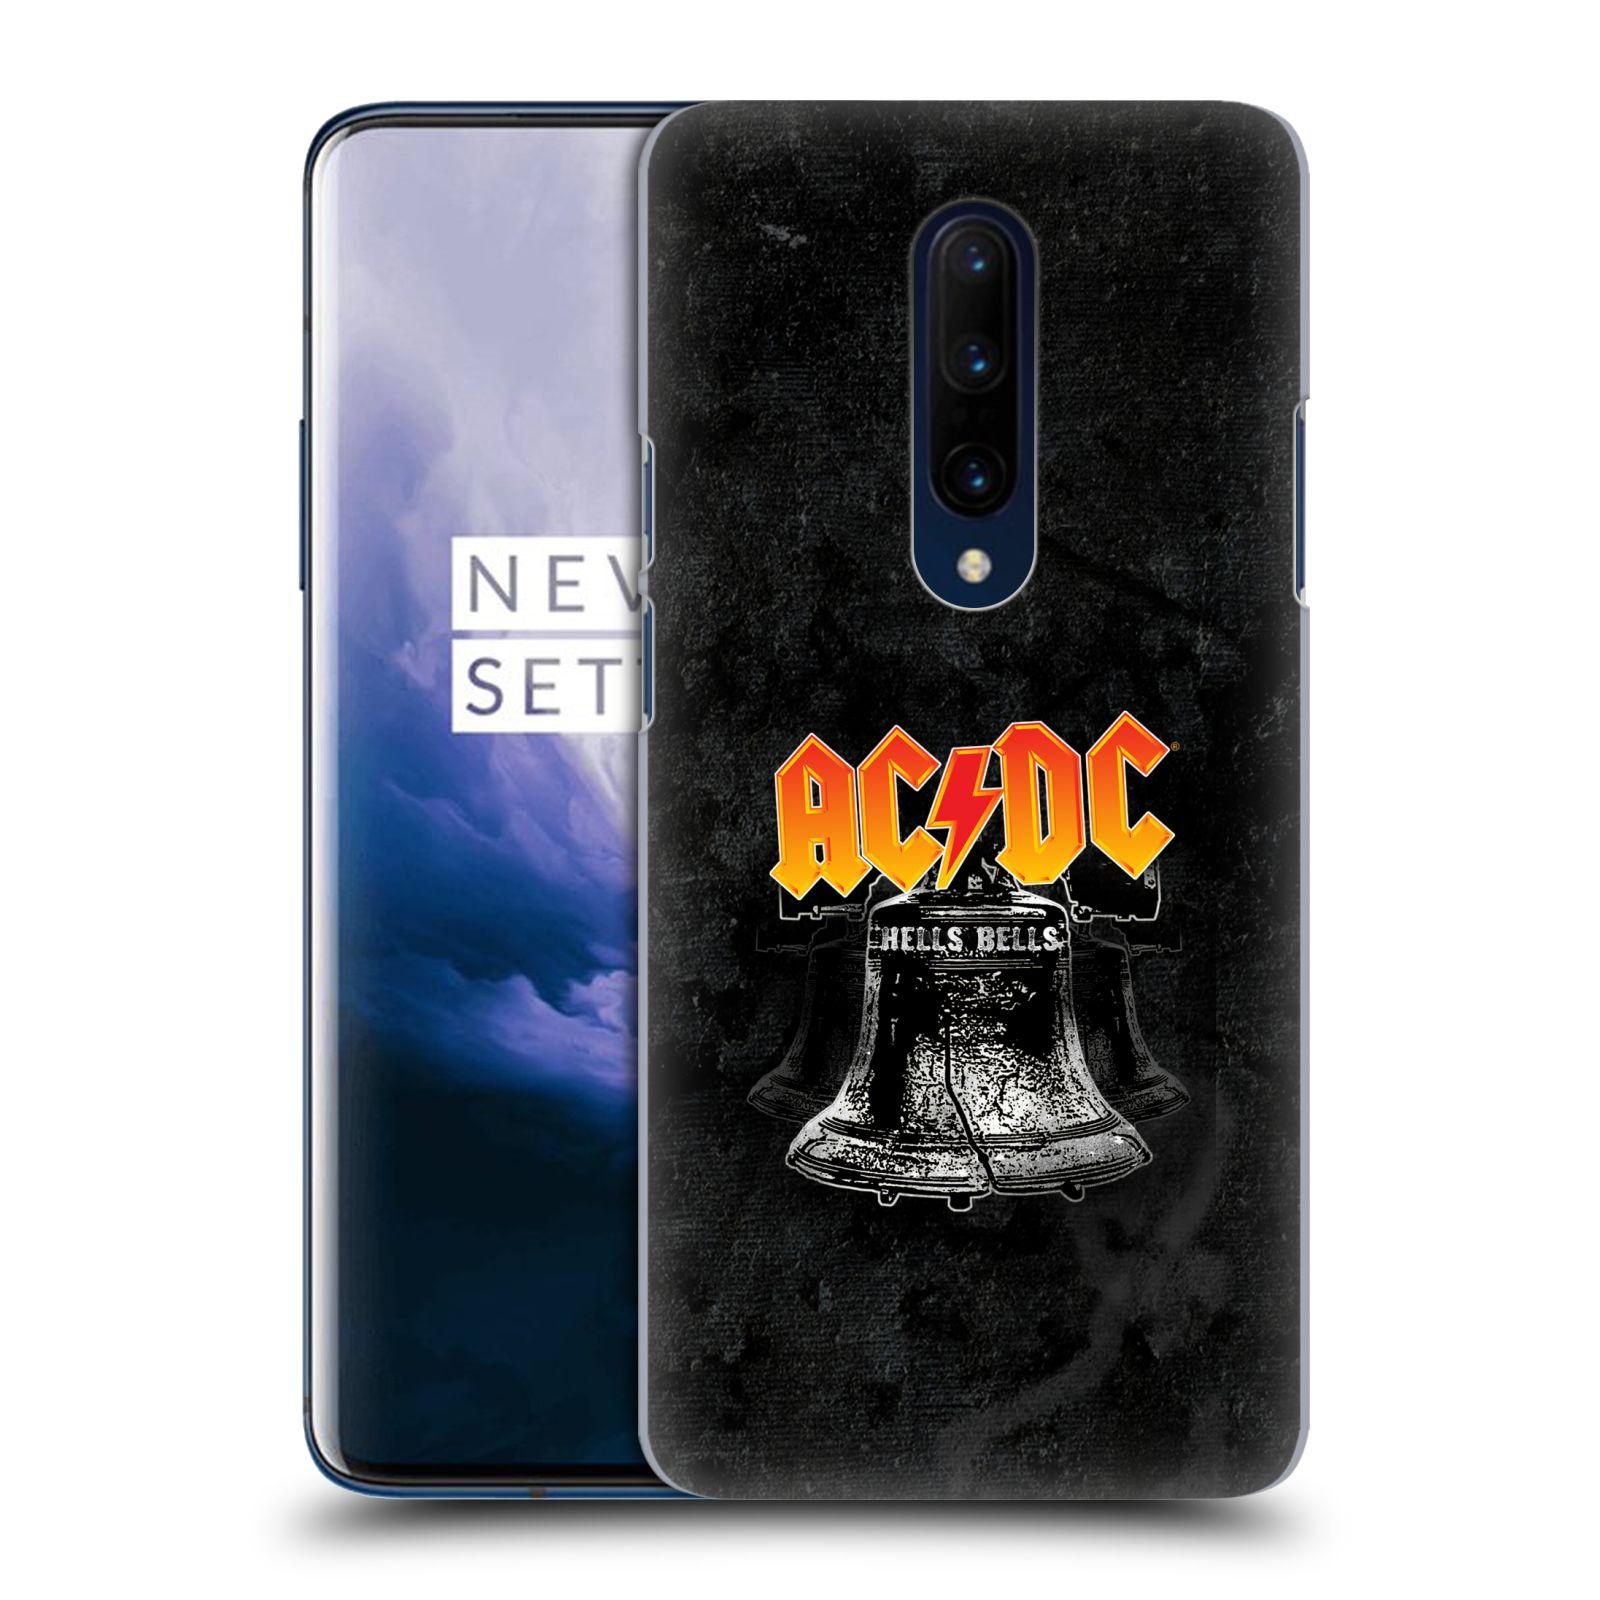 Plastové pouzdro na mobil OnePlus 7 Pro - Head Case - AC/DC Hells Bells